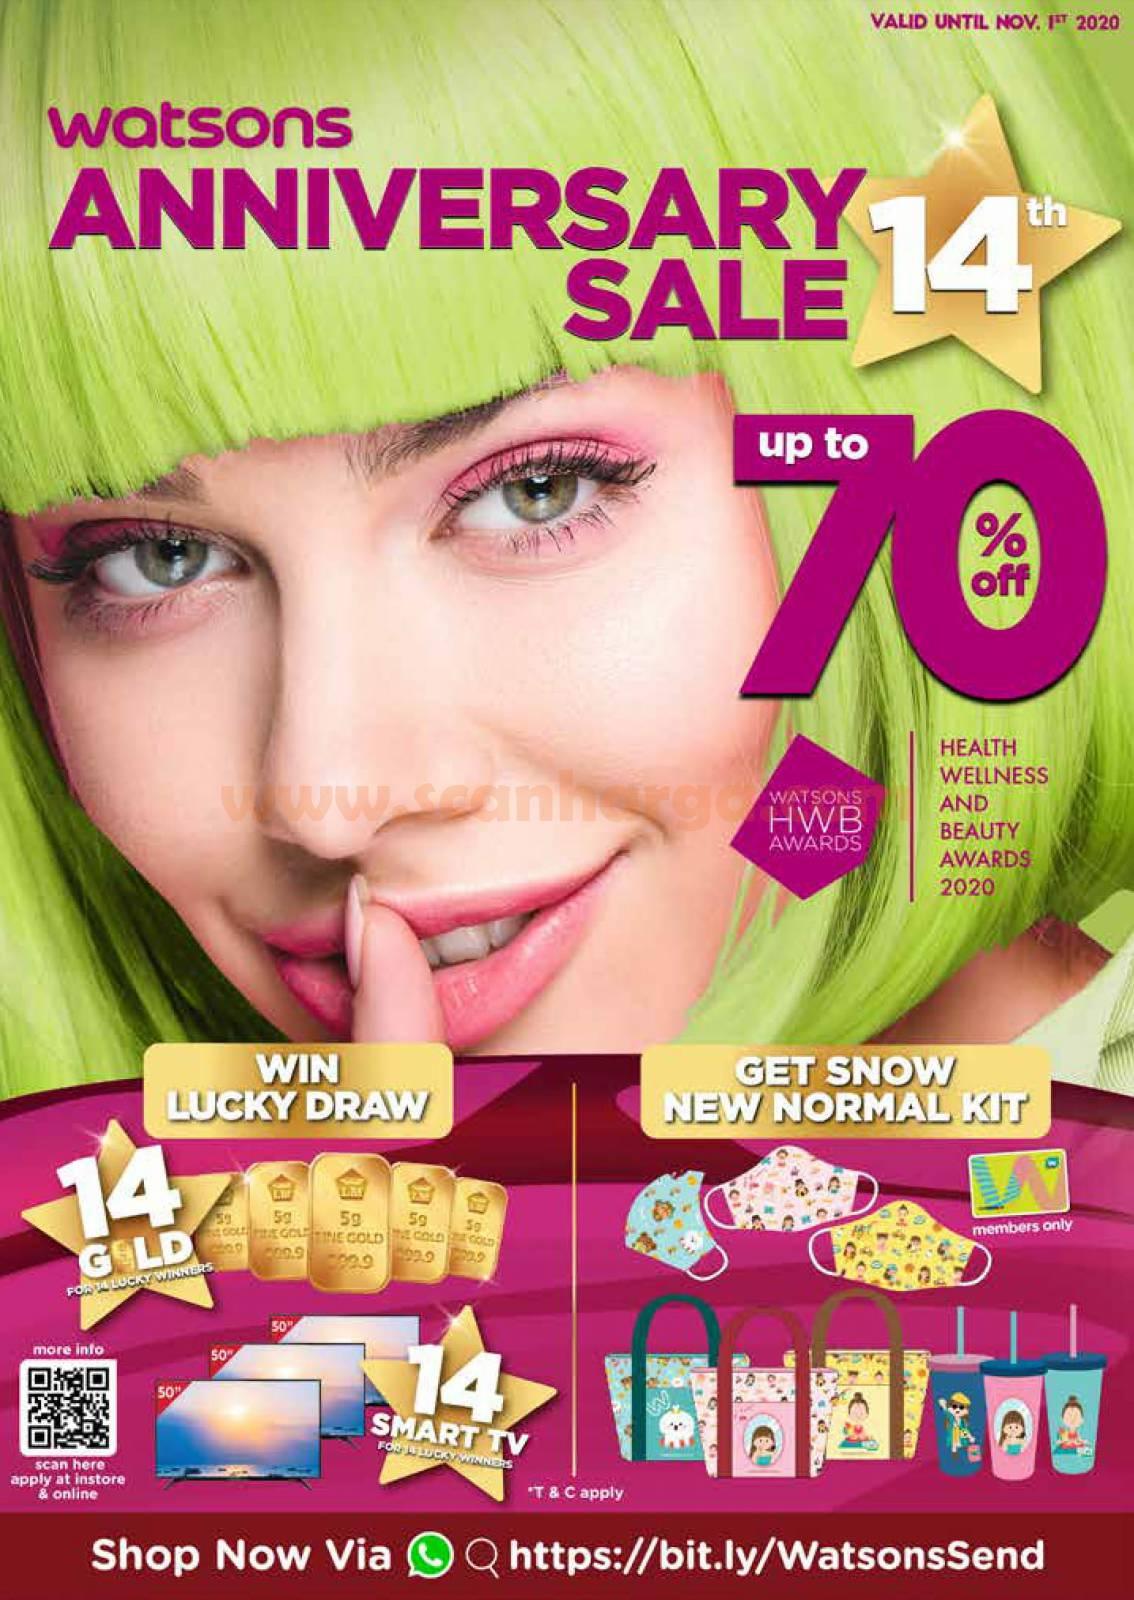 Katalog Promo Watsons 14th Anniversary Sale Up To 70% Off Oktober 2020